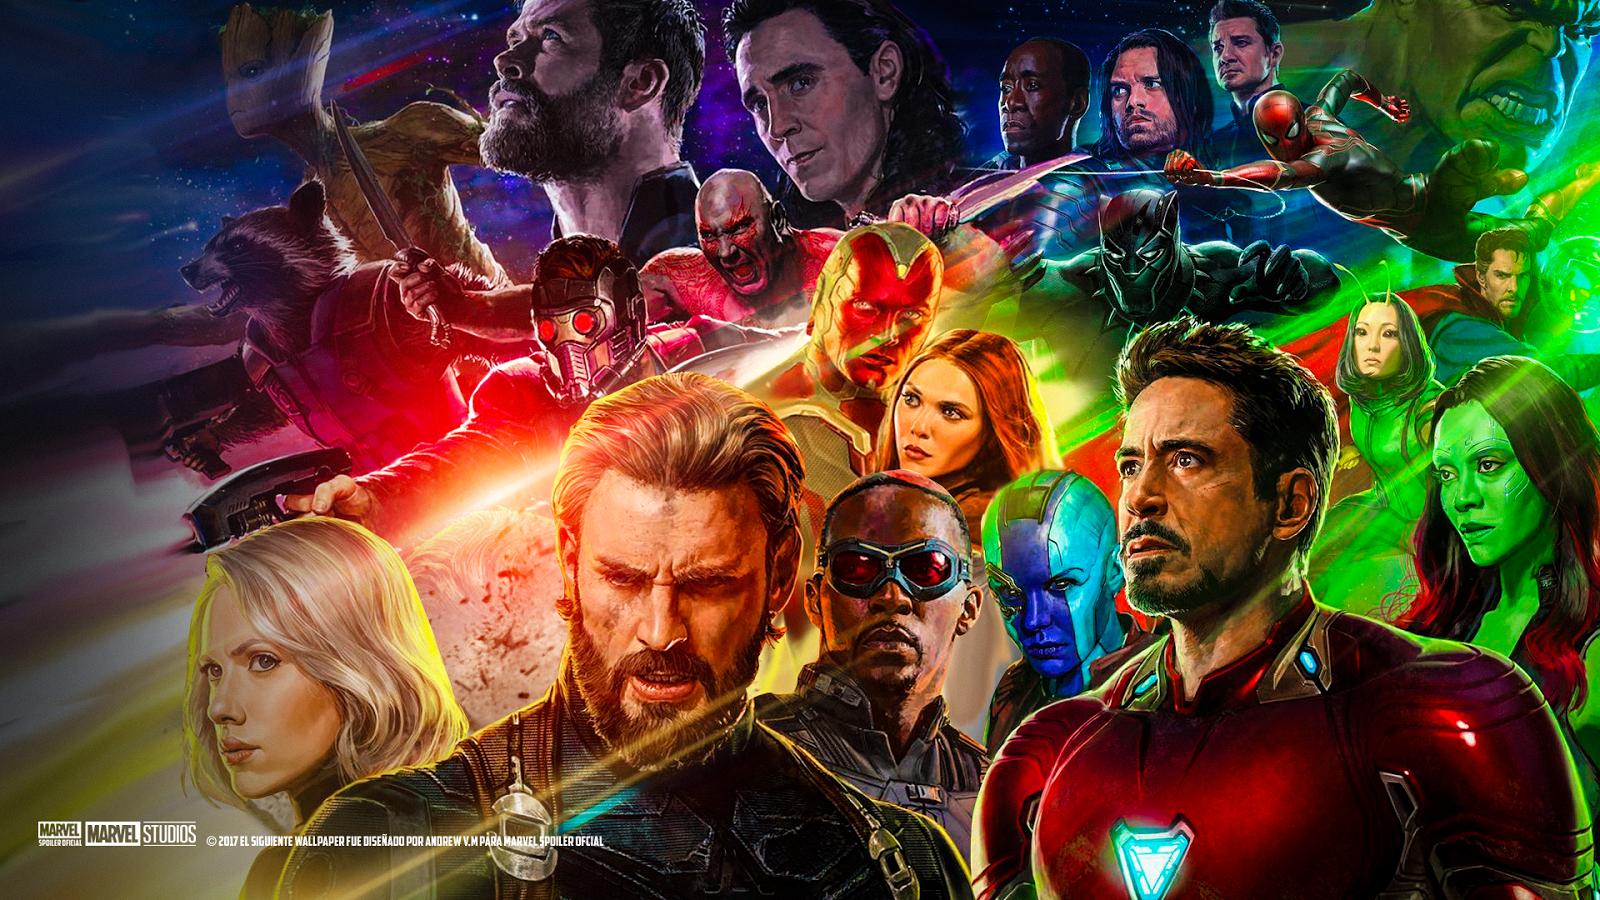 Avengers Infinity War Pc Fondos De Pantalla Hd Fondos De Pantalla Avengers Hd 1600x900 Wallpapertip